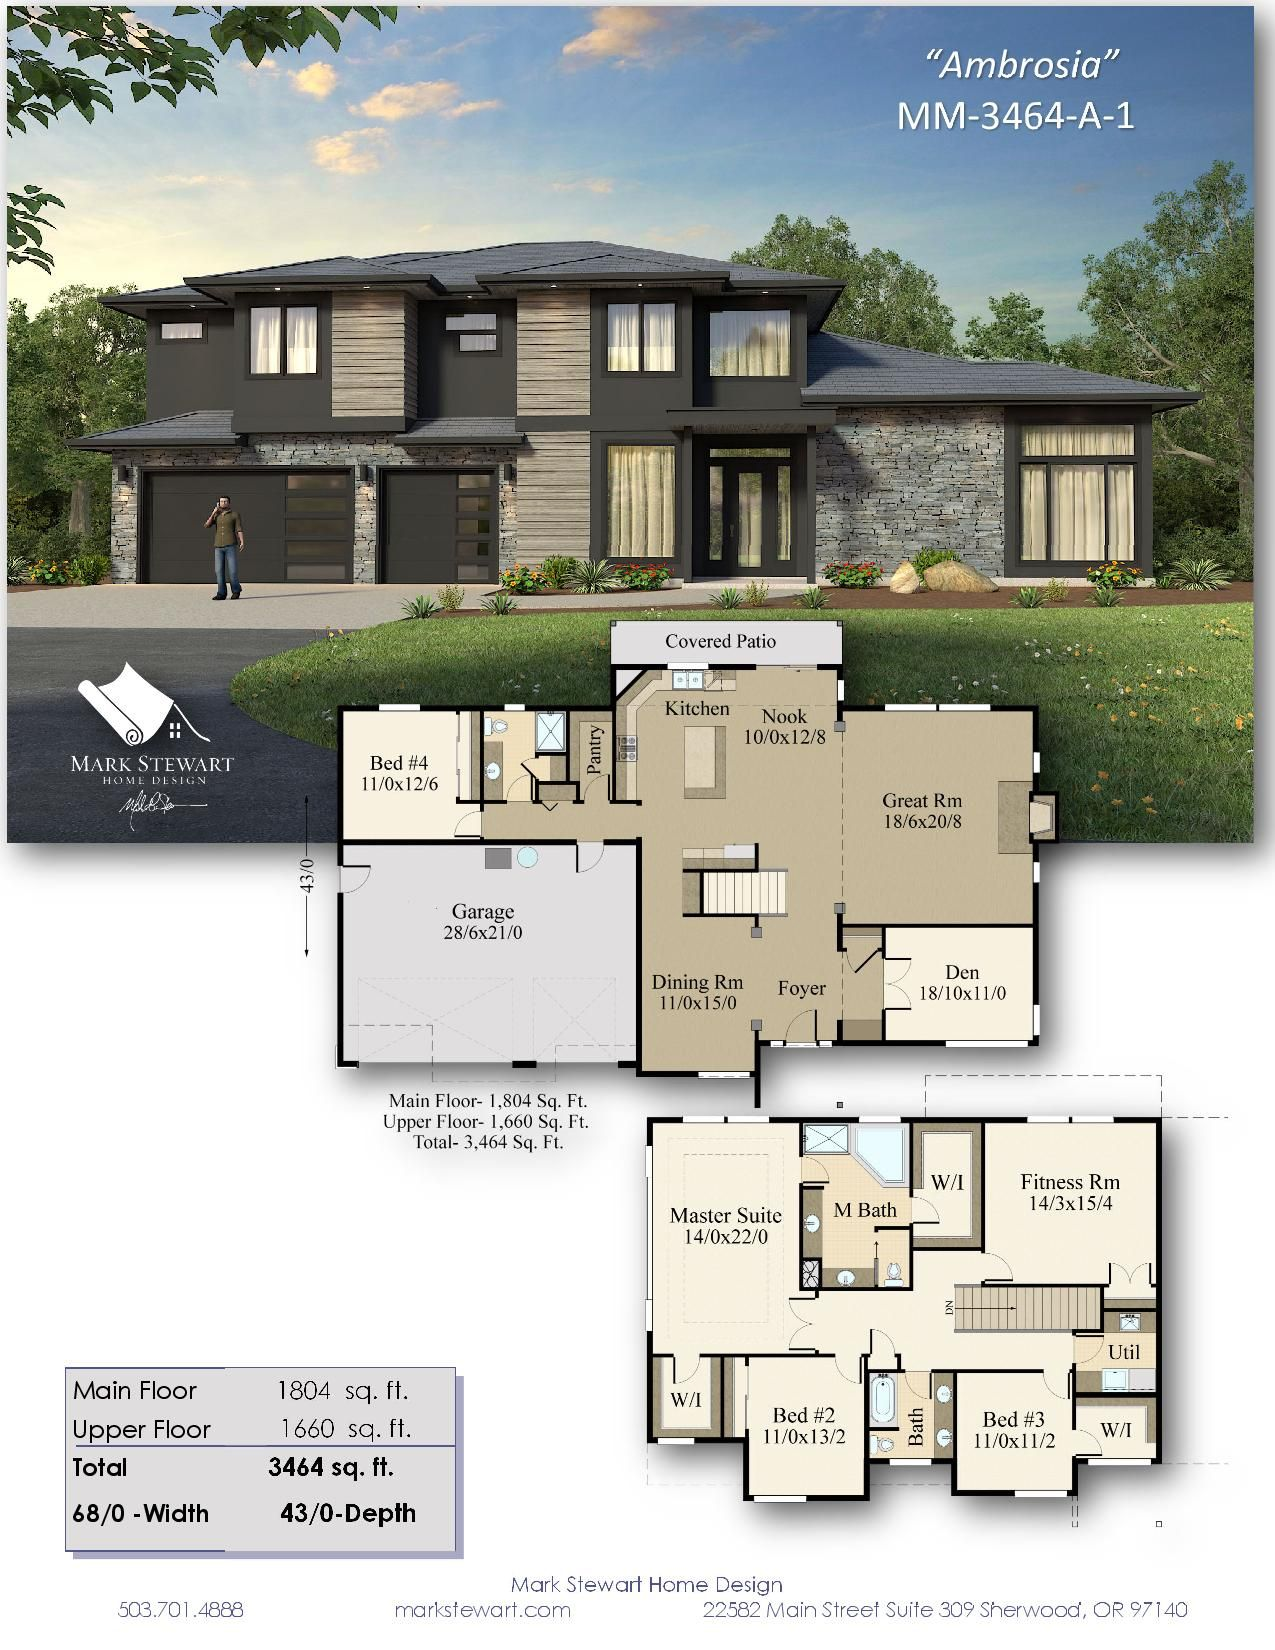 Ambrosia By Mark Stewart Home Design Modern House Floor Plans House Plans Mansion Craftsman House Plans